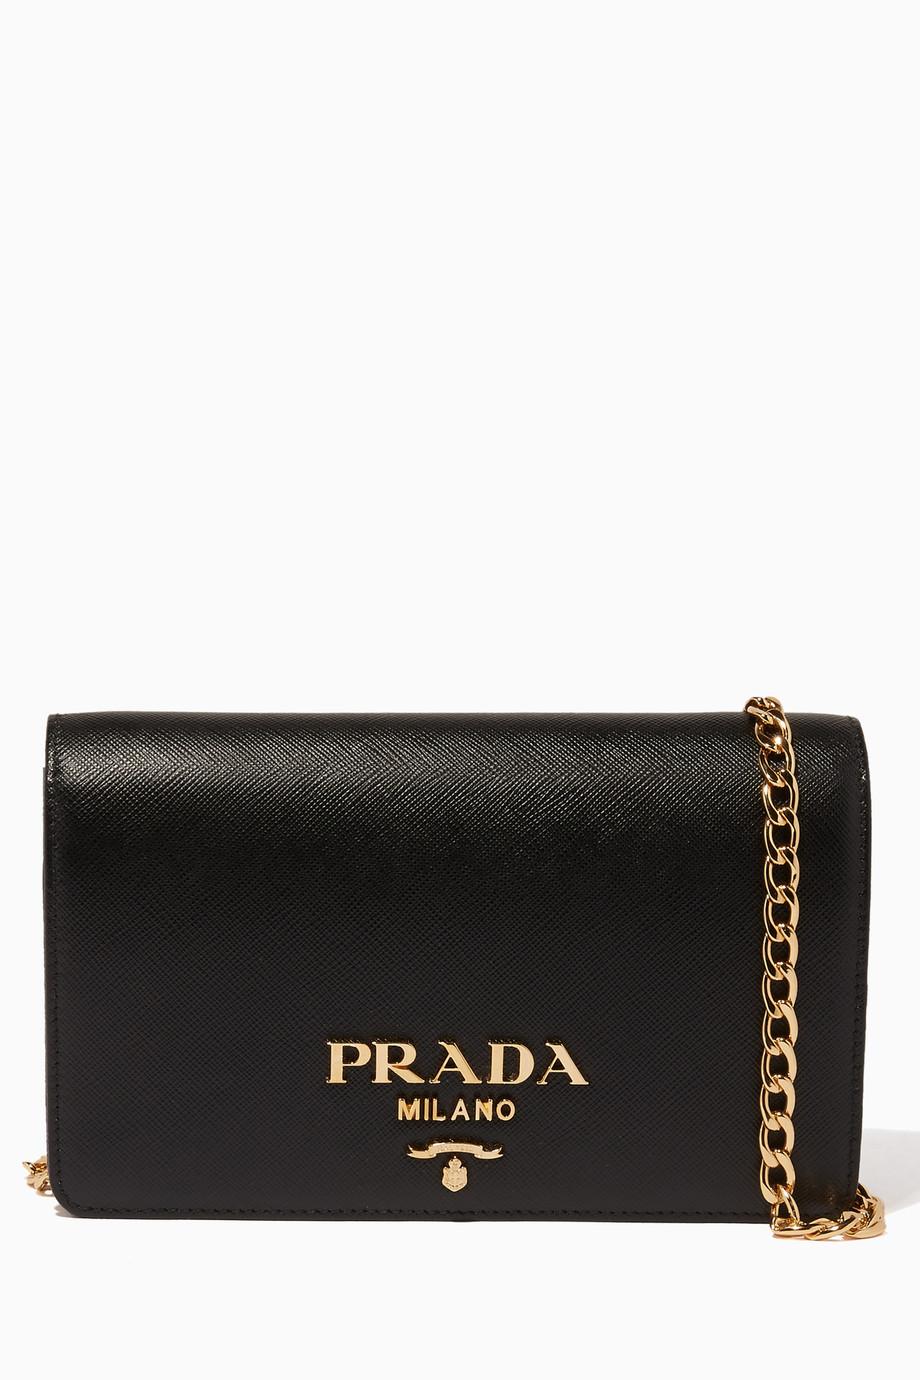 58fb3167c تسوق حقيبة كروس لوكس صغيرة سوداء Prada أسود للنساء   اُناس السعودية